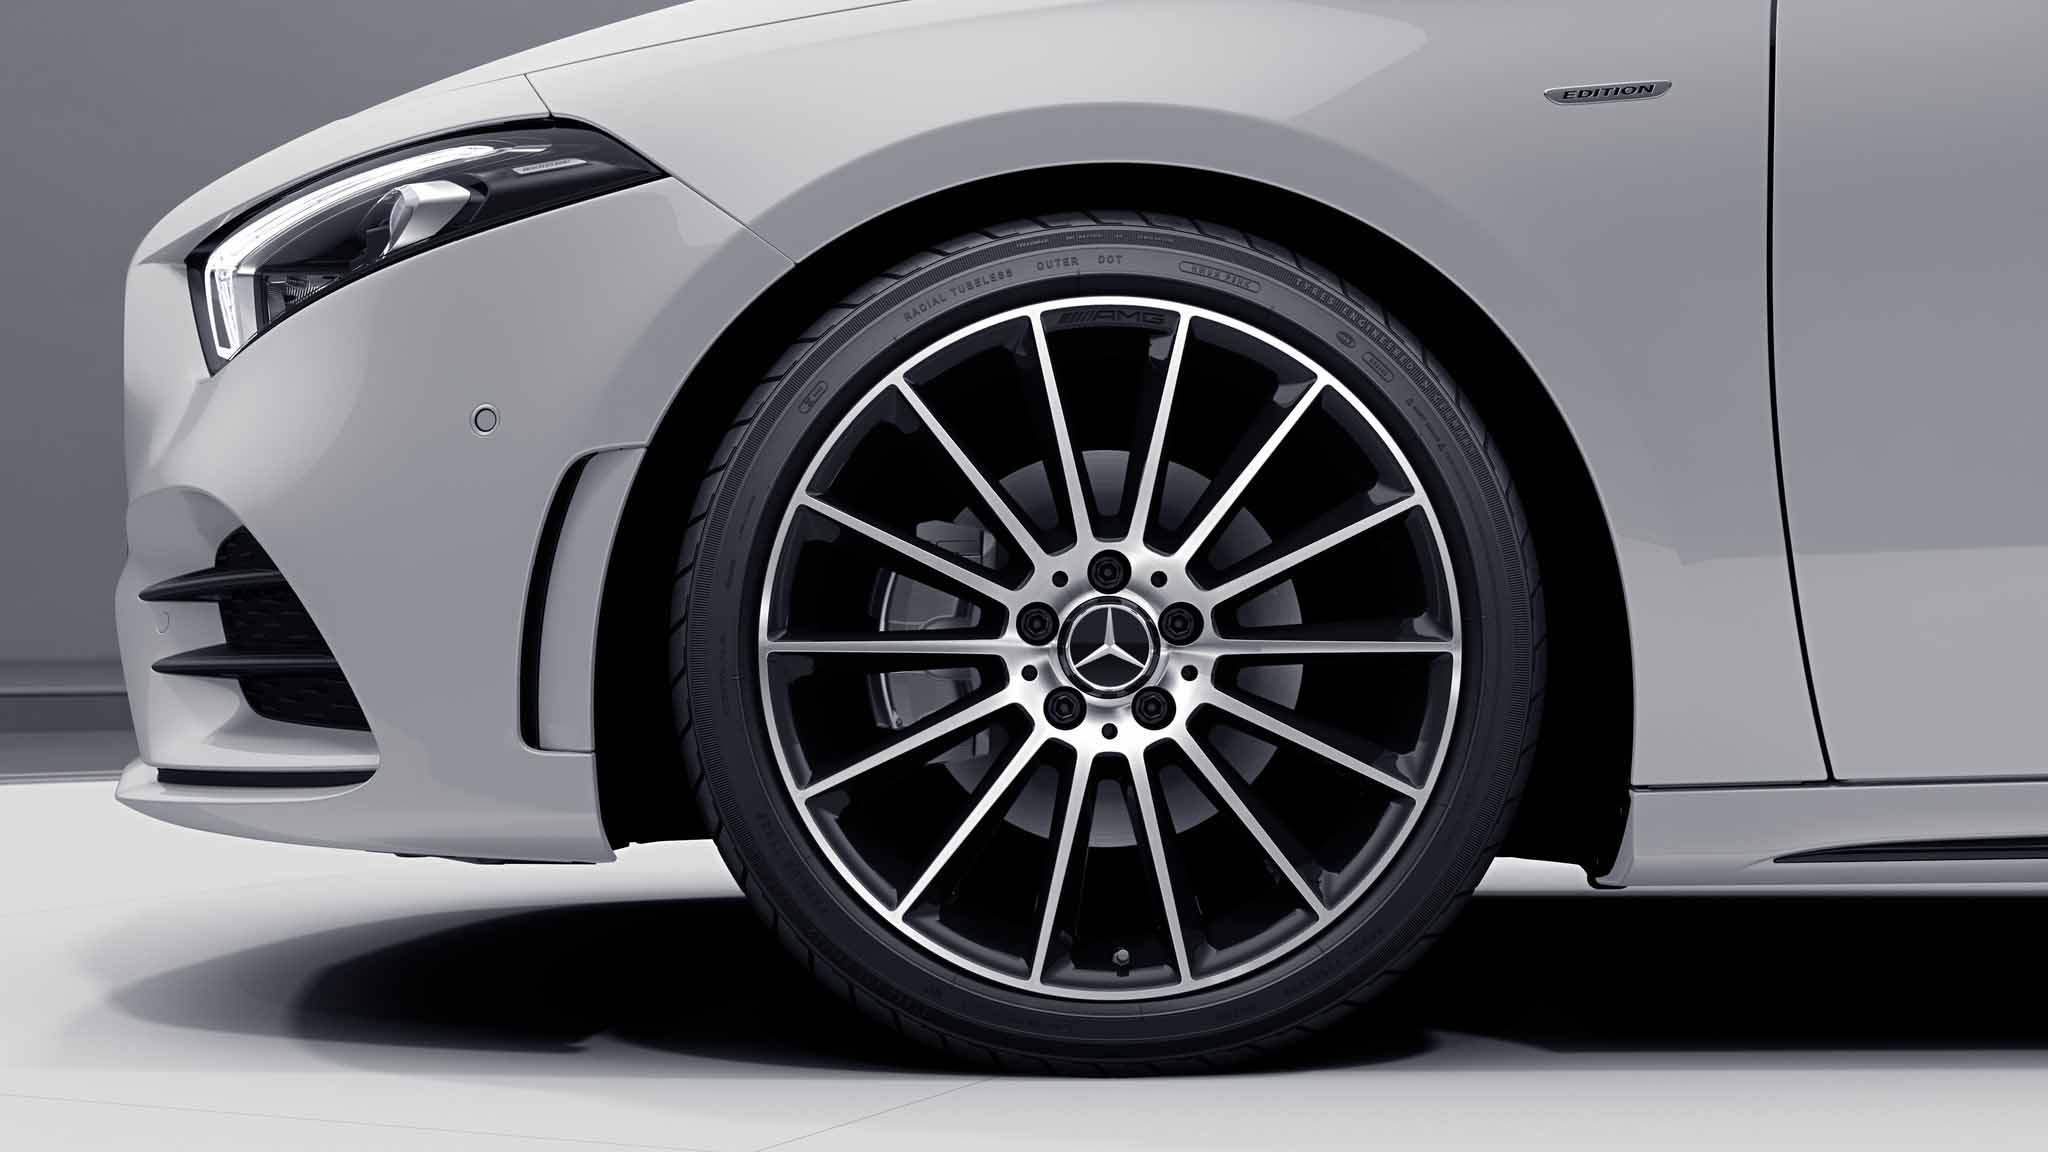 "Jantes AMG 19"" multibranches de la Mercedes-Benz Classe A Berline"